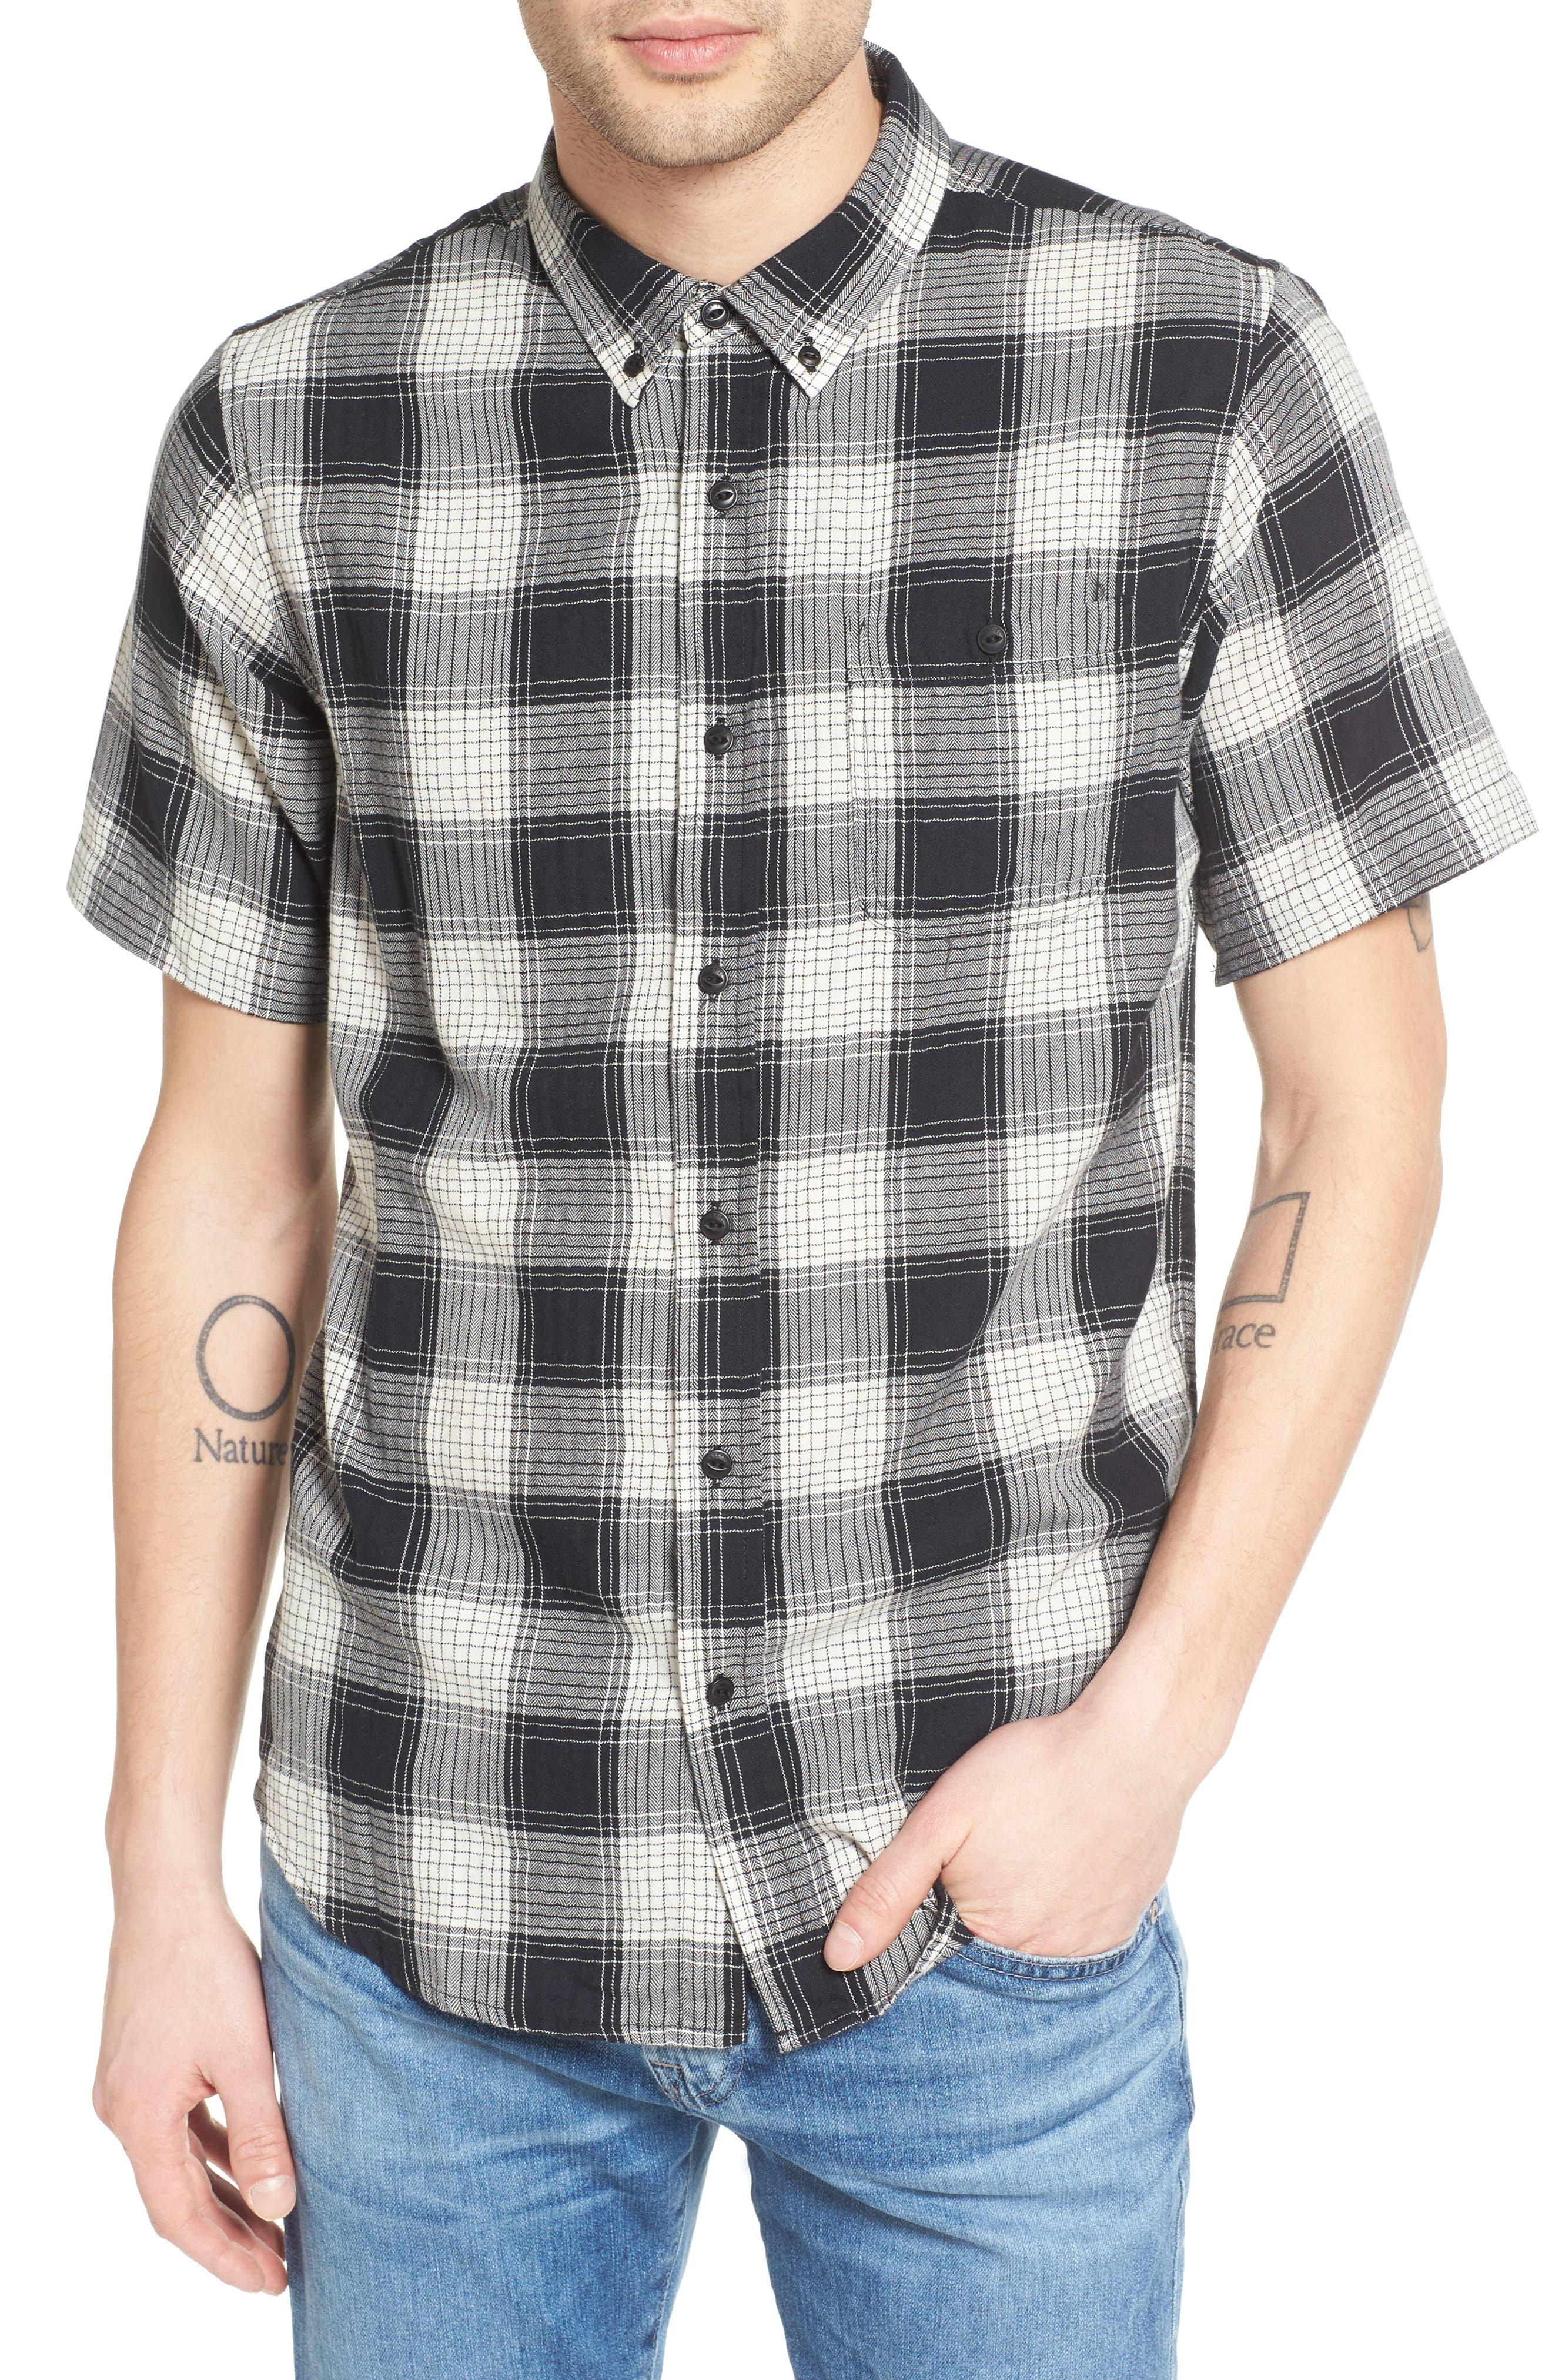 Herringbone Woven Plaid Shirt,                             Main thumbnail 1, color,                             100